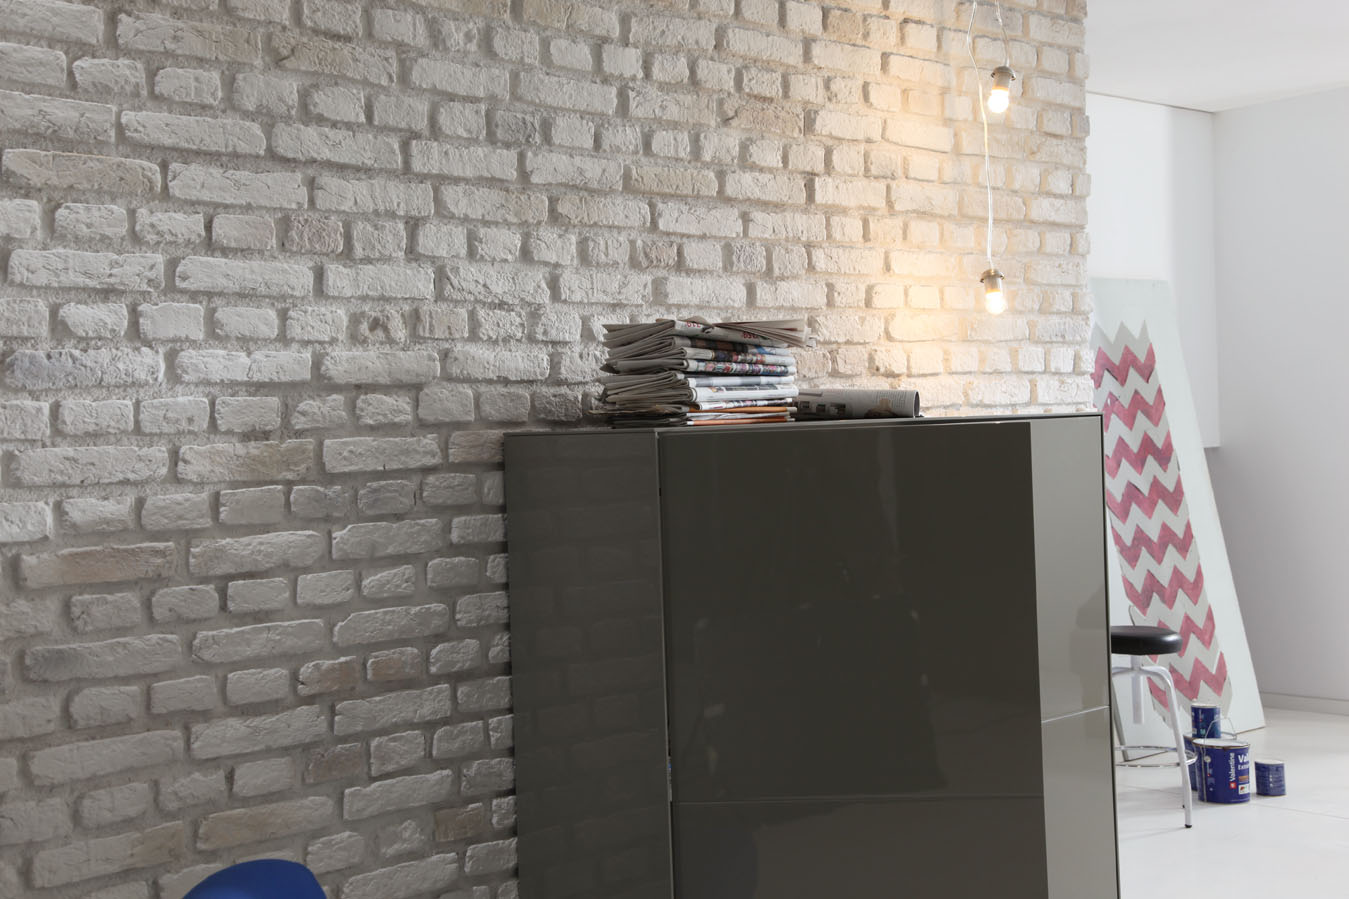 Panel ladrillo urban - Revestimientos de chimeneas leroy merlin ...